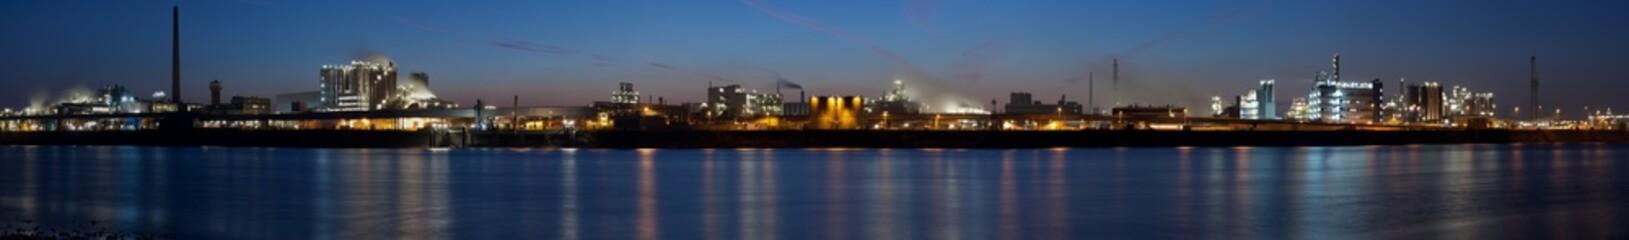 Raffinerieen (Panorama)